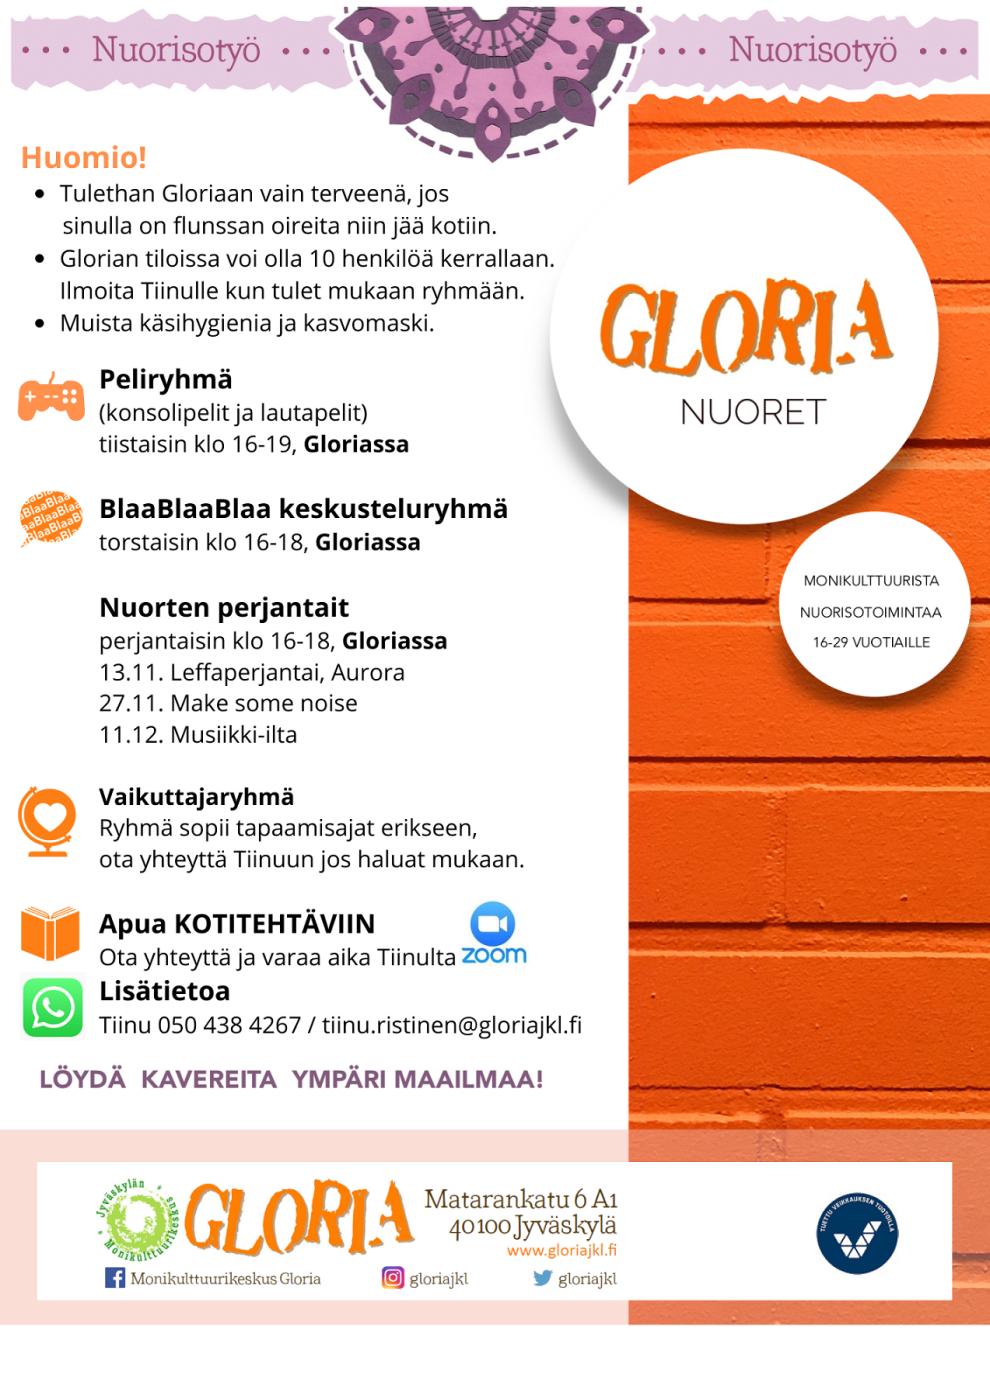 Monikulttuurikeskus Gloria